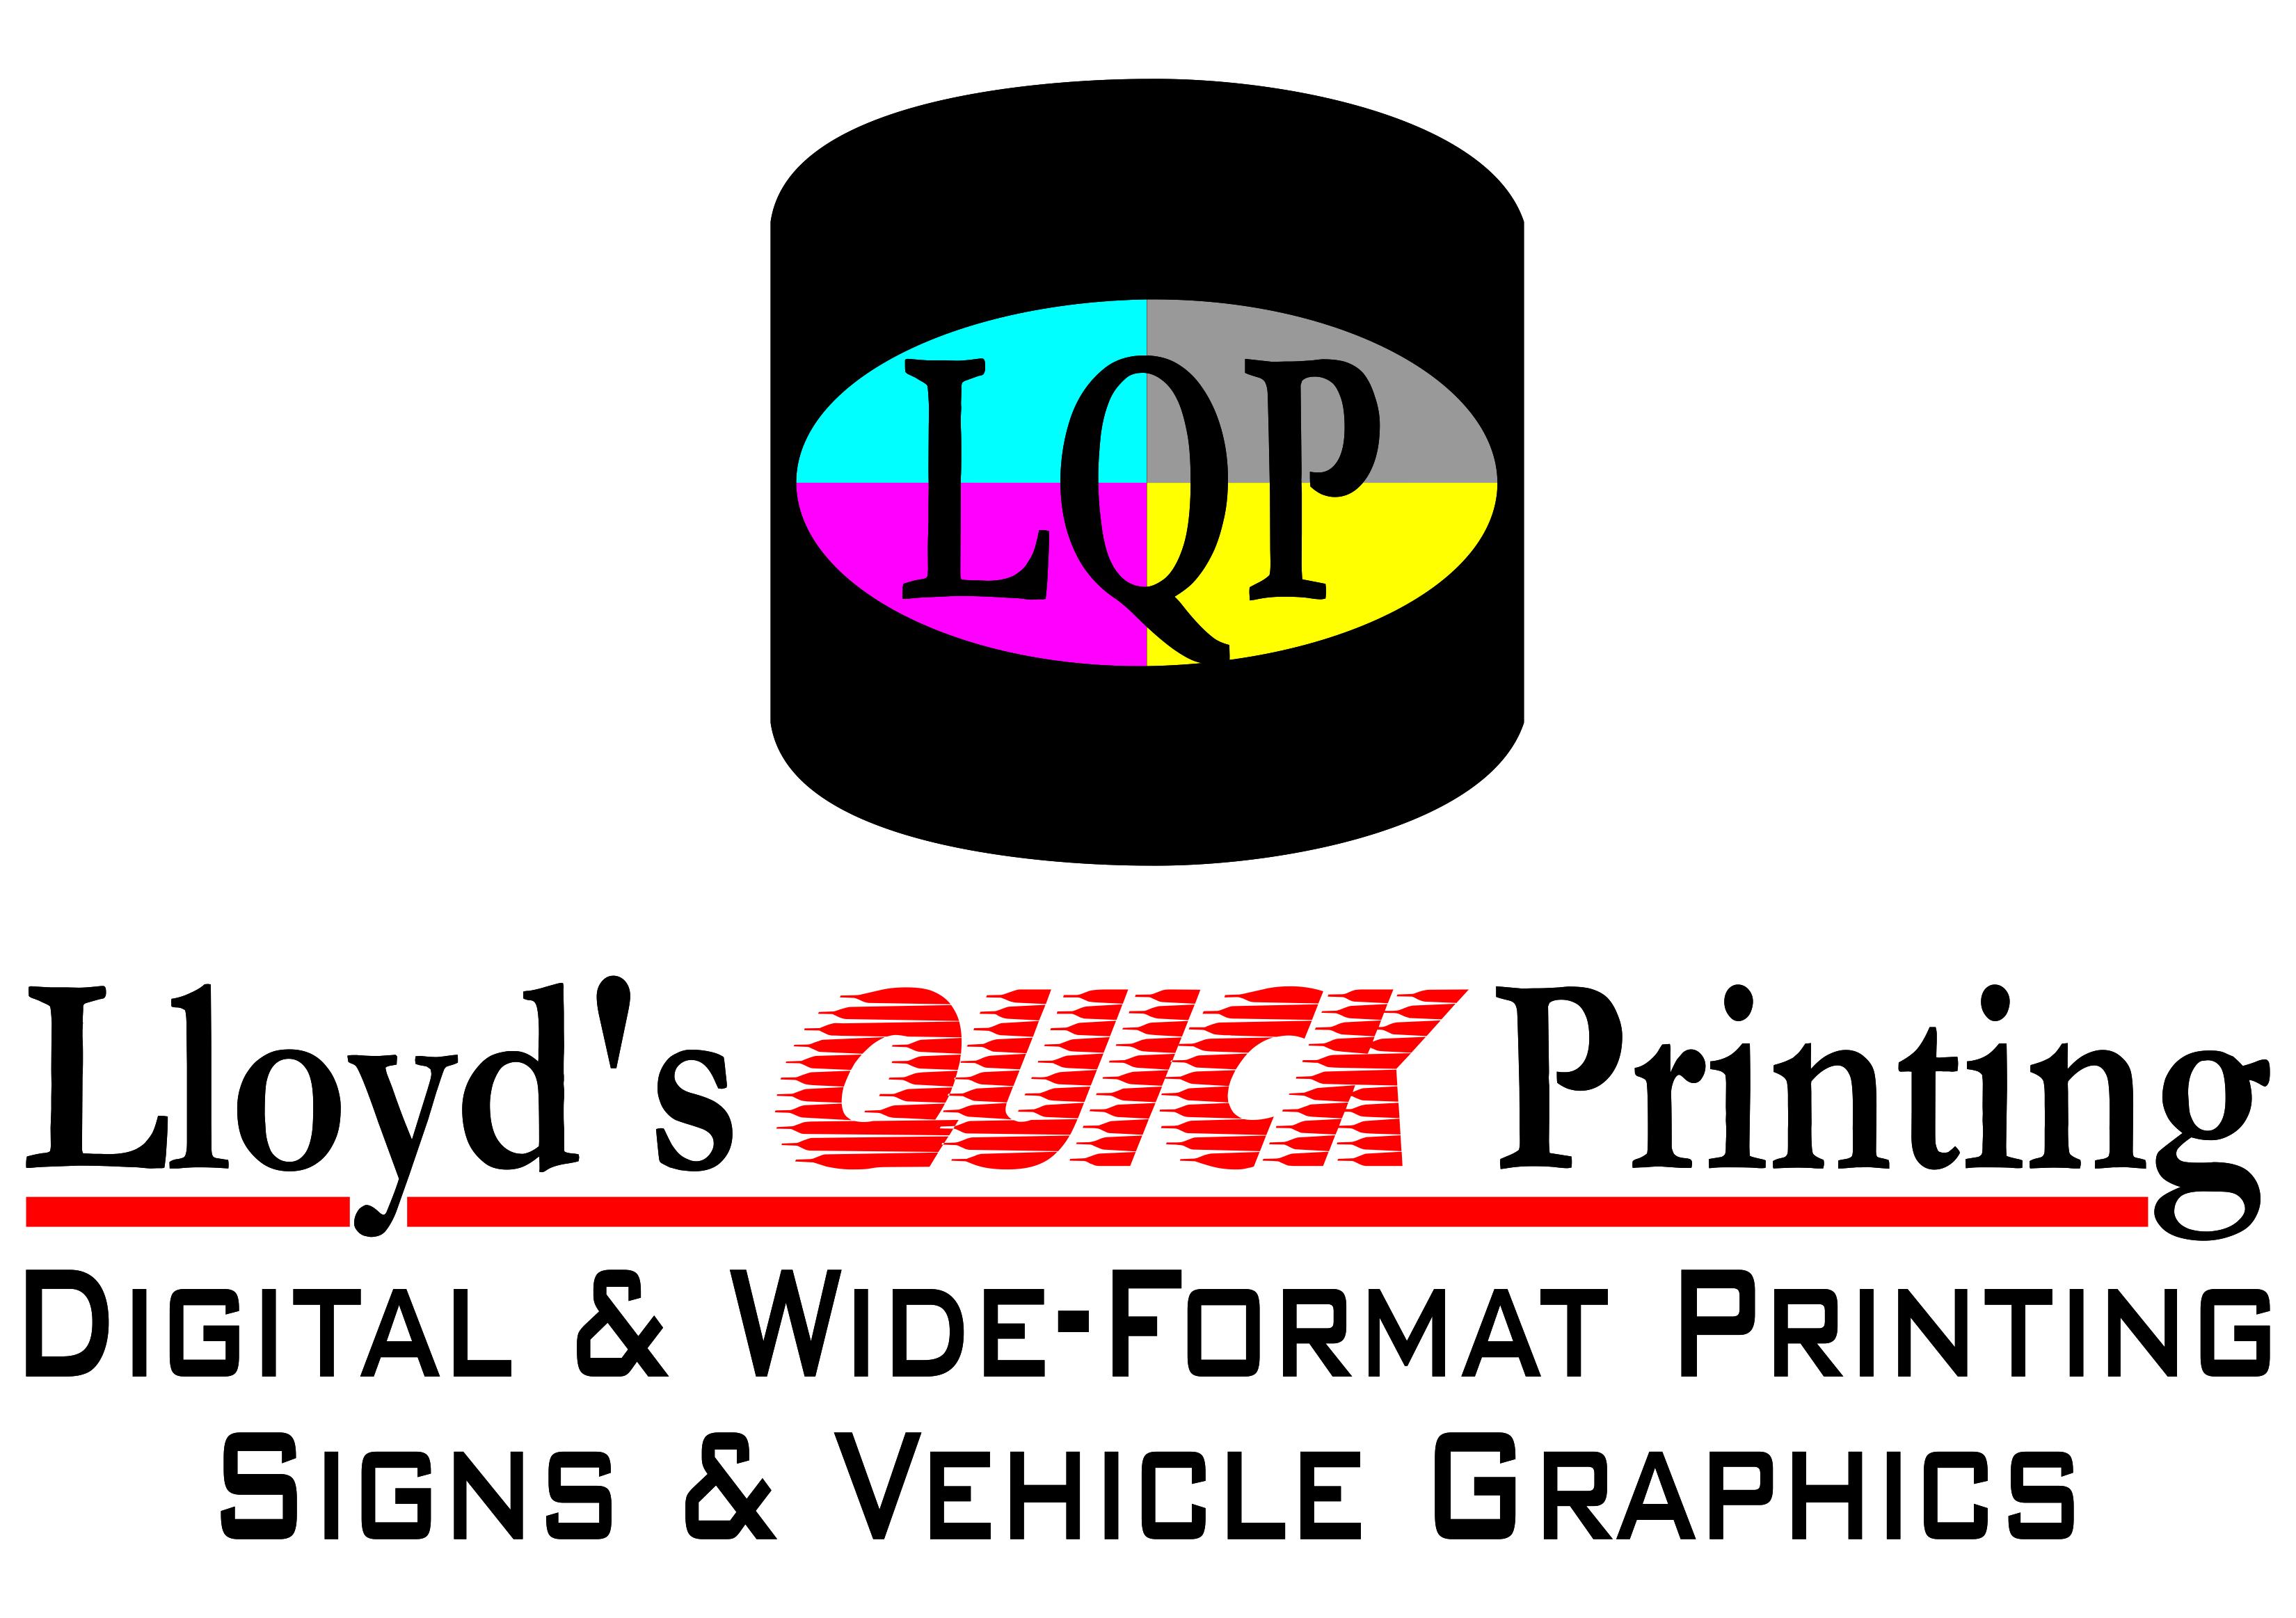 Lloyds Quick Printing & Signs